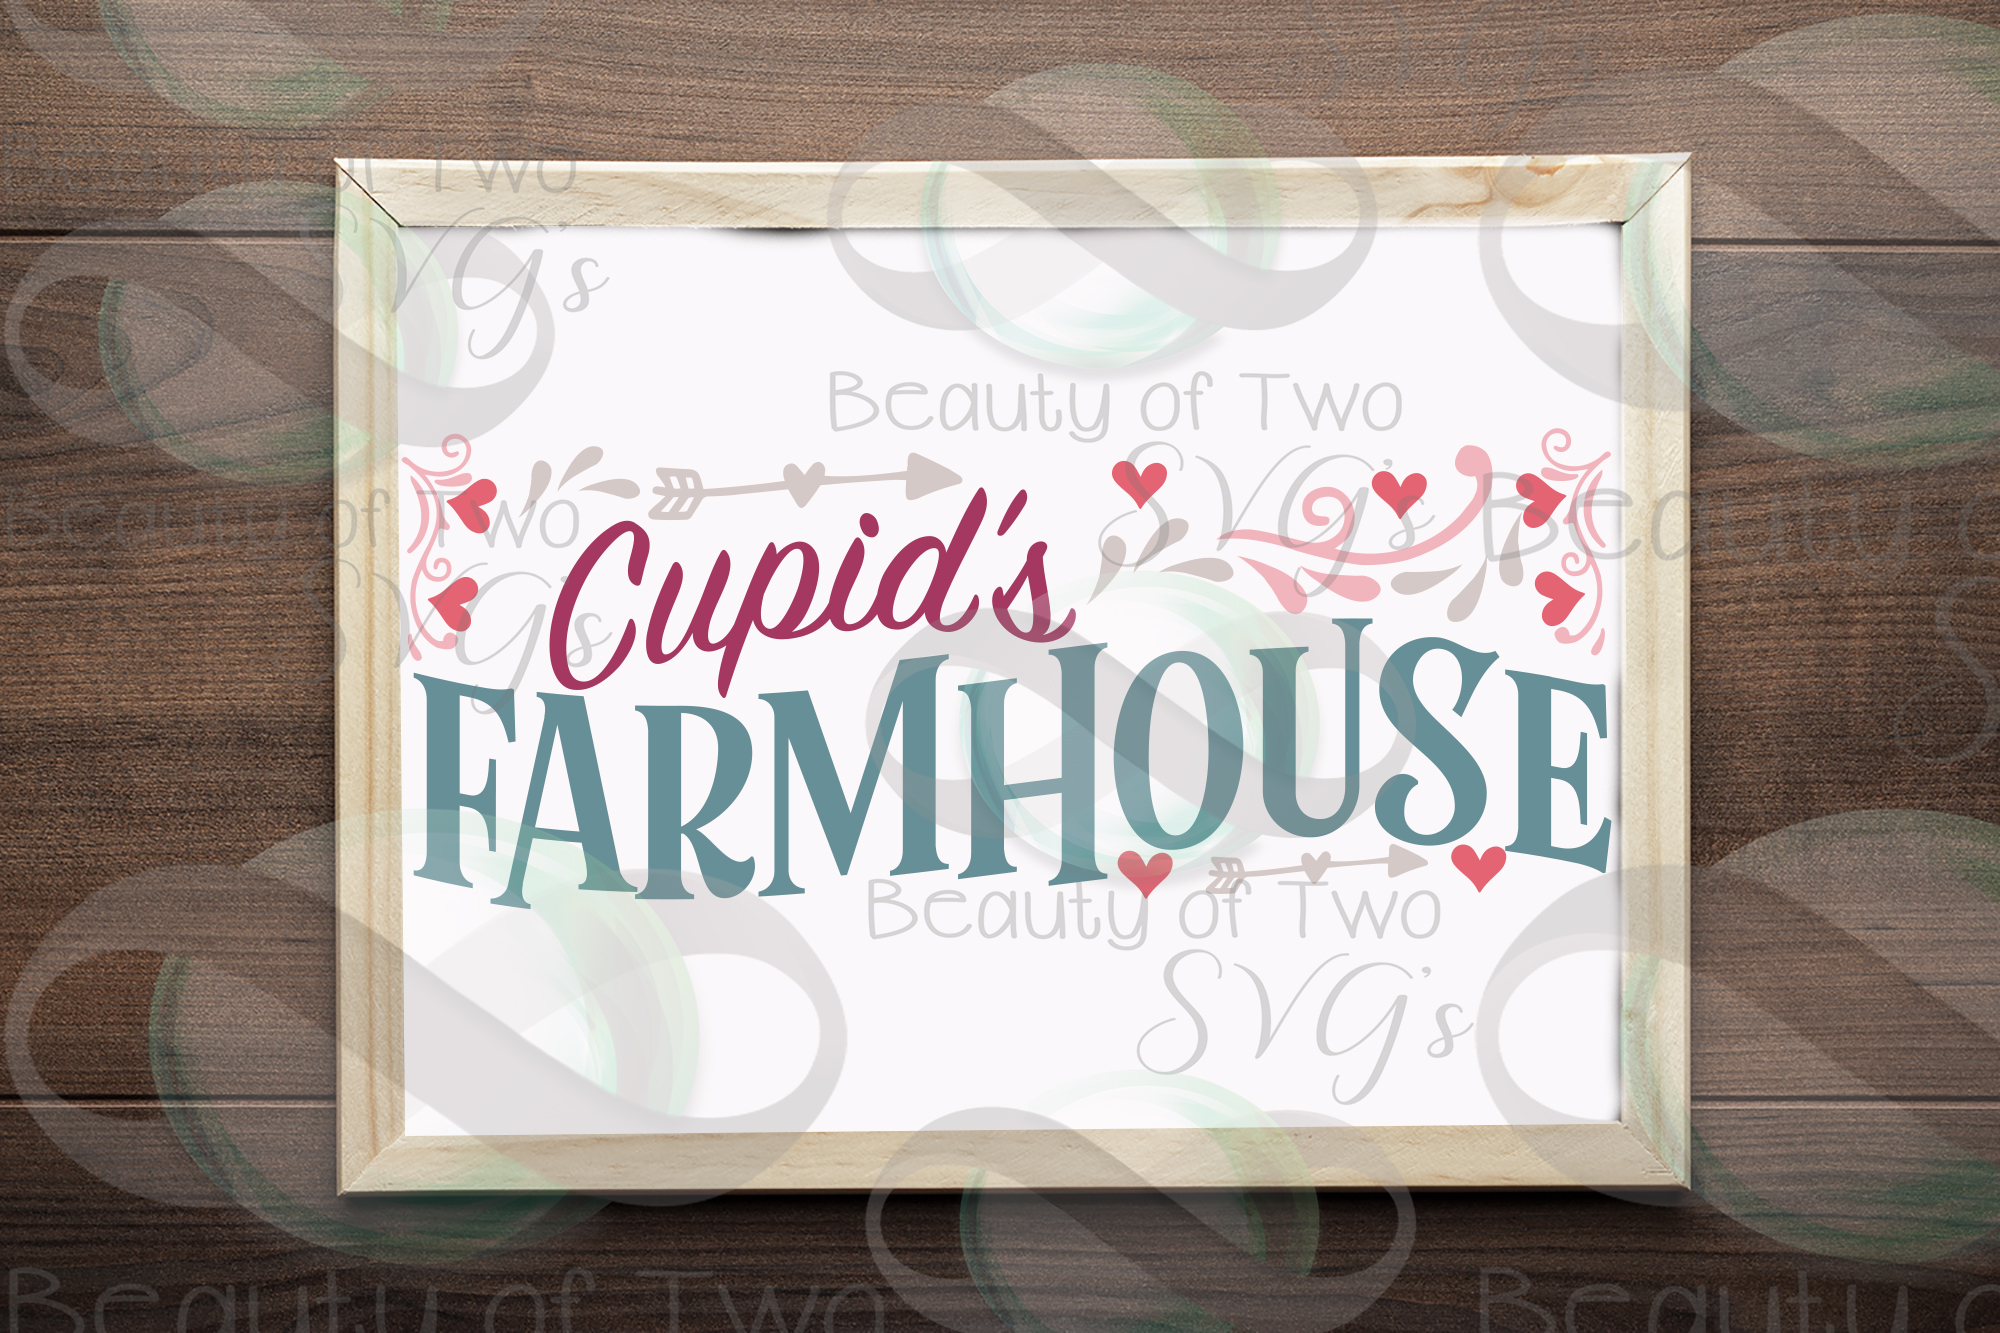 Valentines Cupids Farmhouse love hearts svg, Valentines svg example image 1